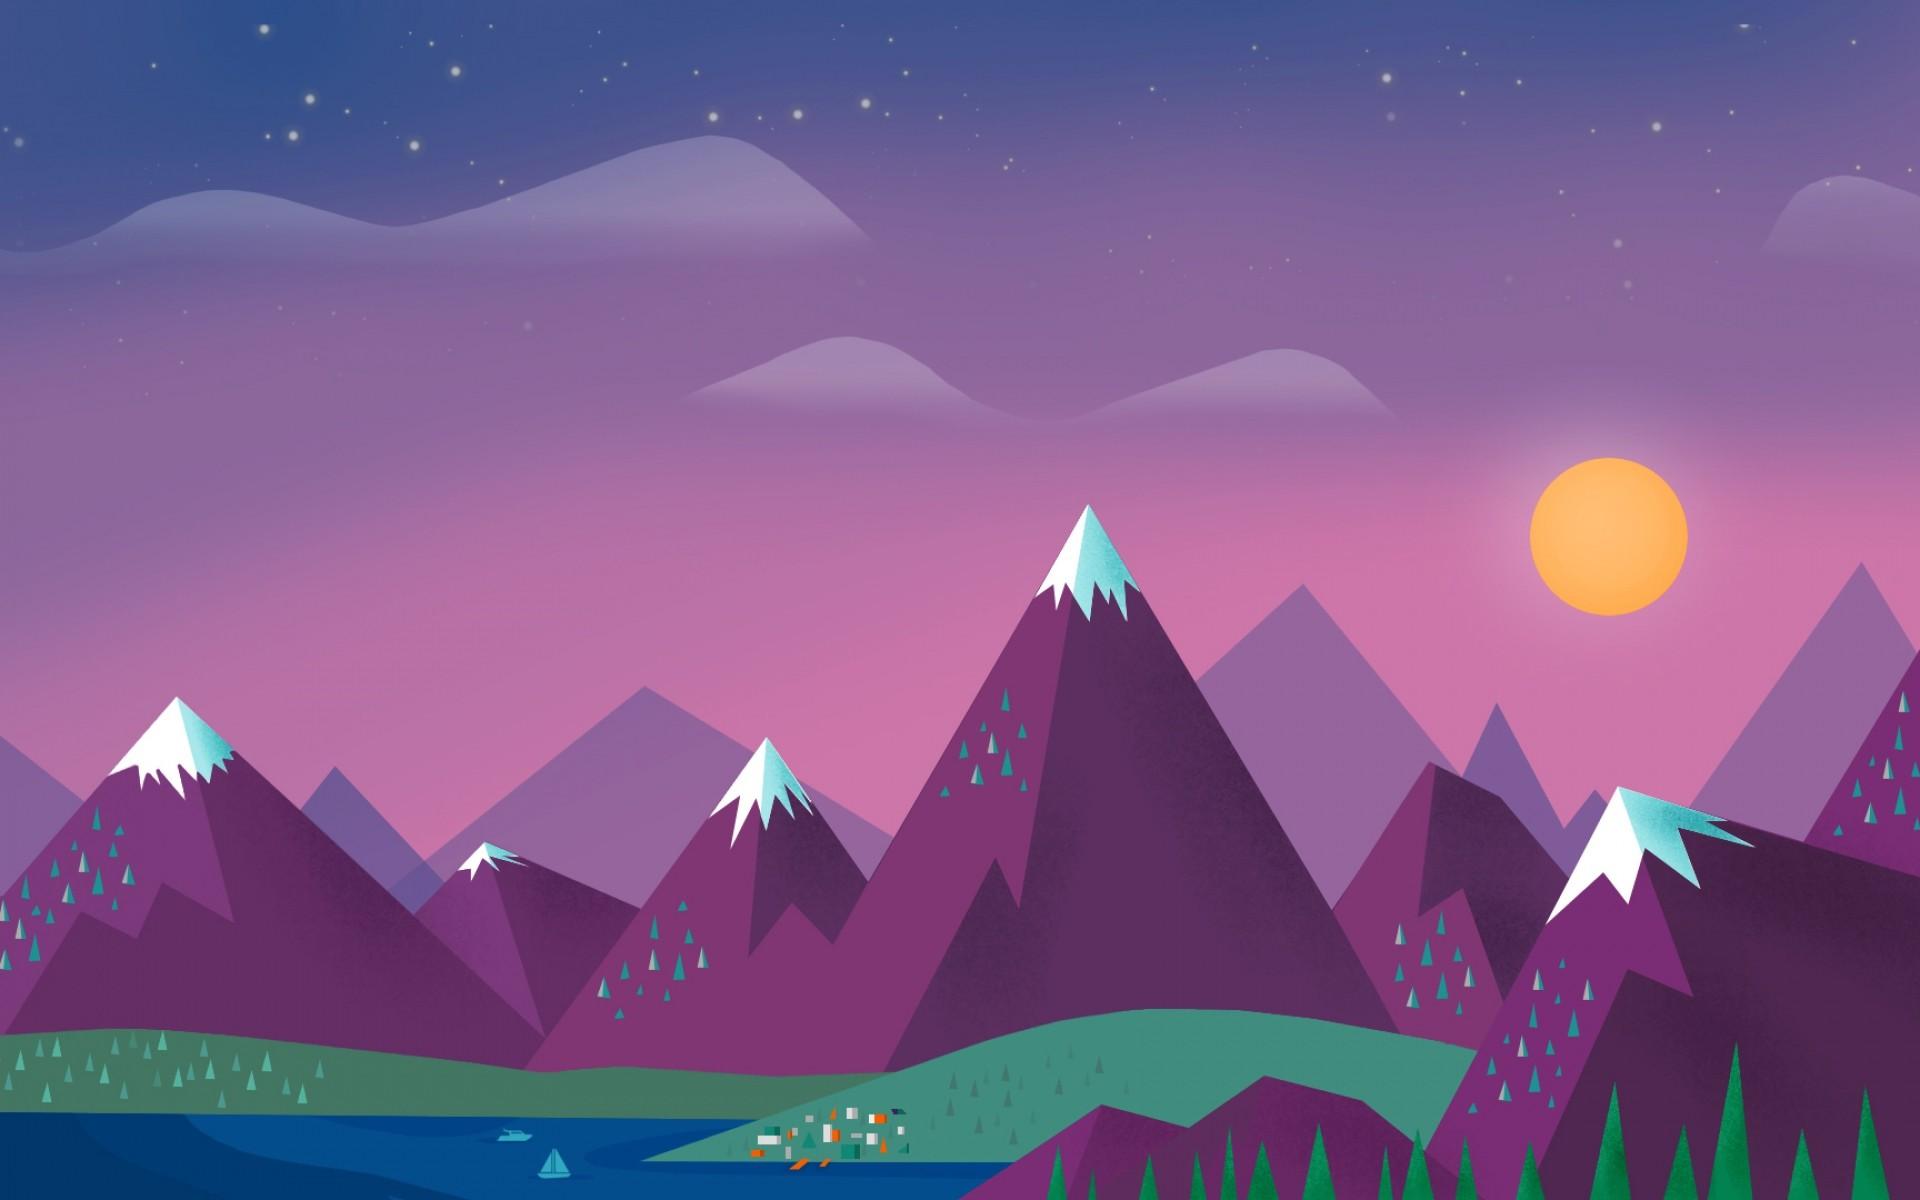 Aesthetic Pixel Art Best Hd Wallpaper Simple Landscape Background 1920x1200 Download Hd Wallpaper Wallpapertip